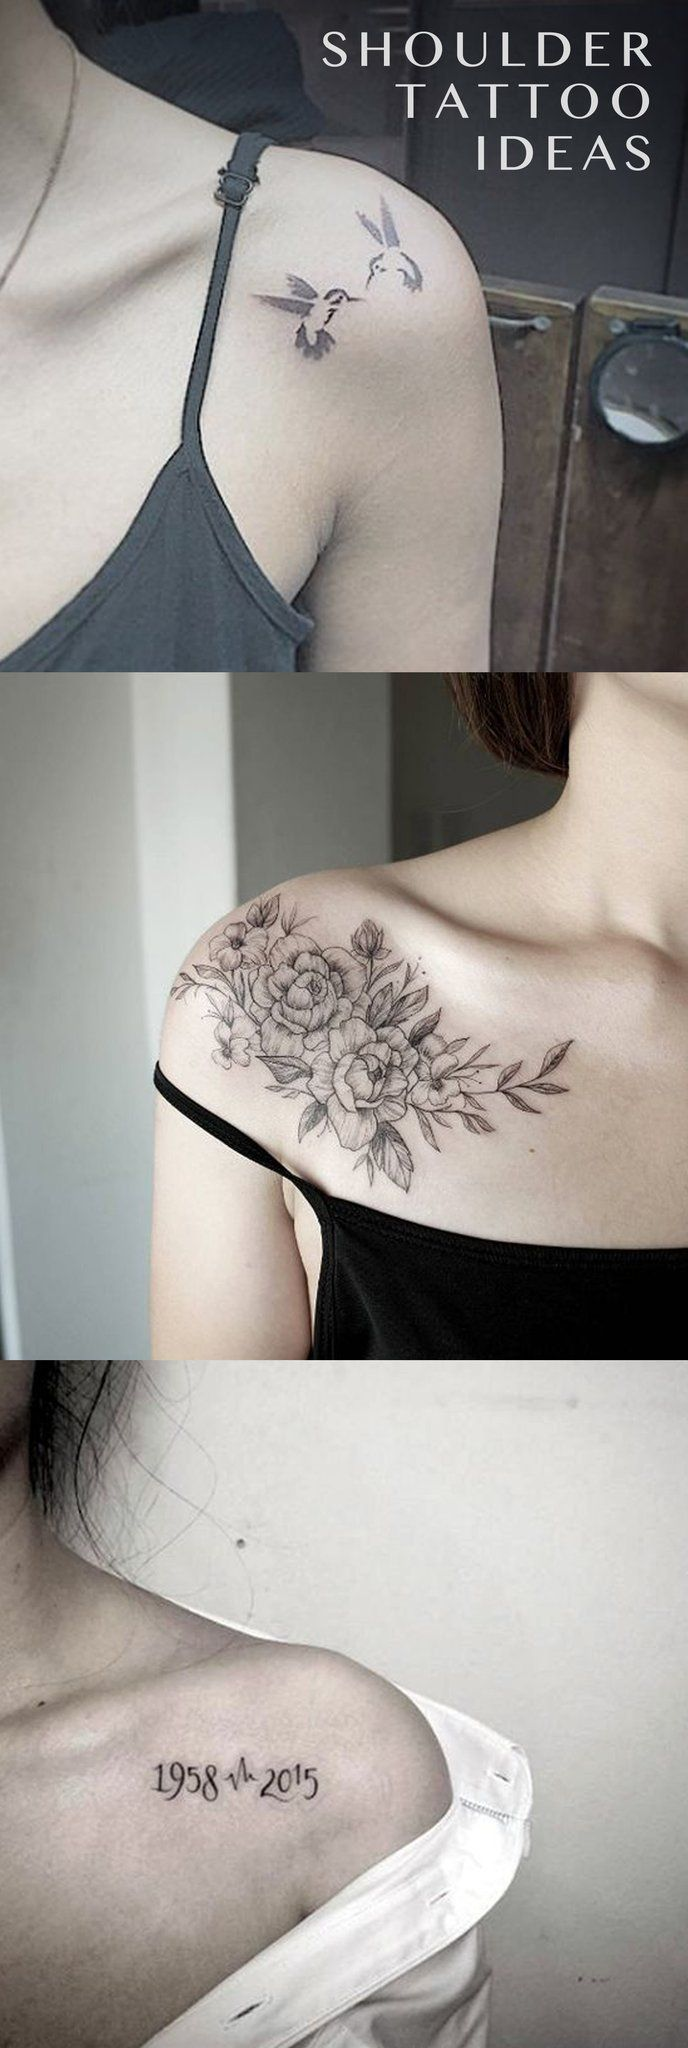 Kleine zarte Schulterblatt Tattoo-Ideen für Frauen – Floral Flower Ideas Del Tatuaje – Sparrow Tatouage – Hochzeit Geburtstag Idéias de tatuagem – w …